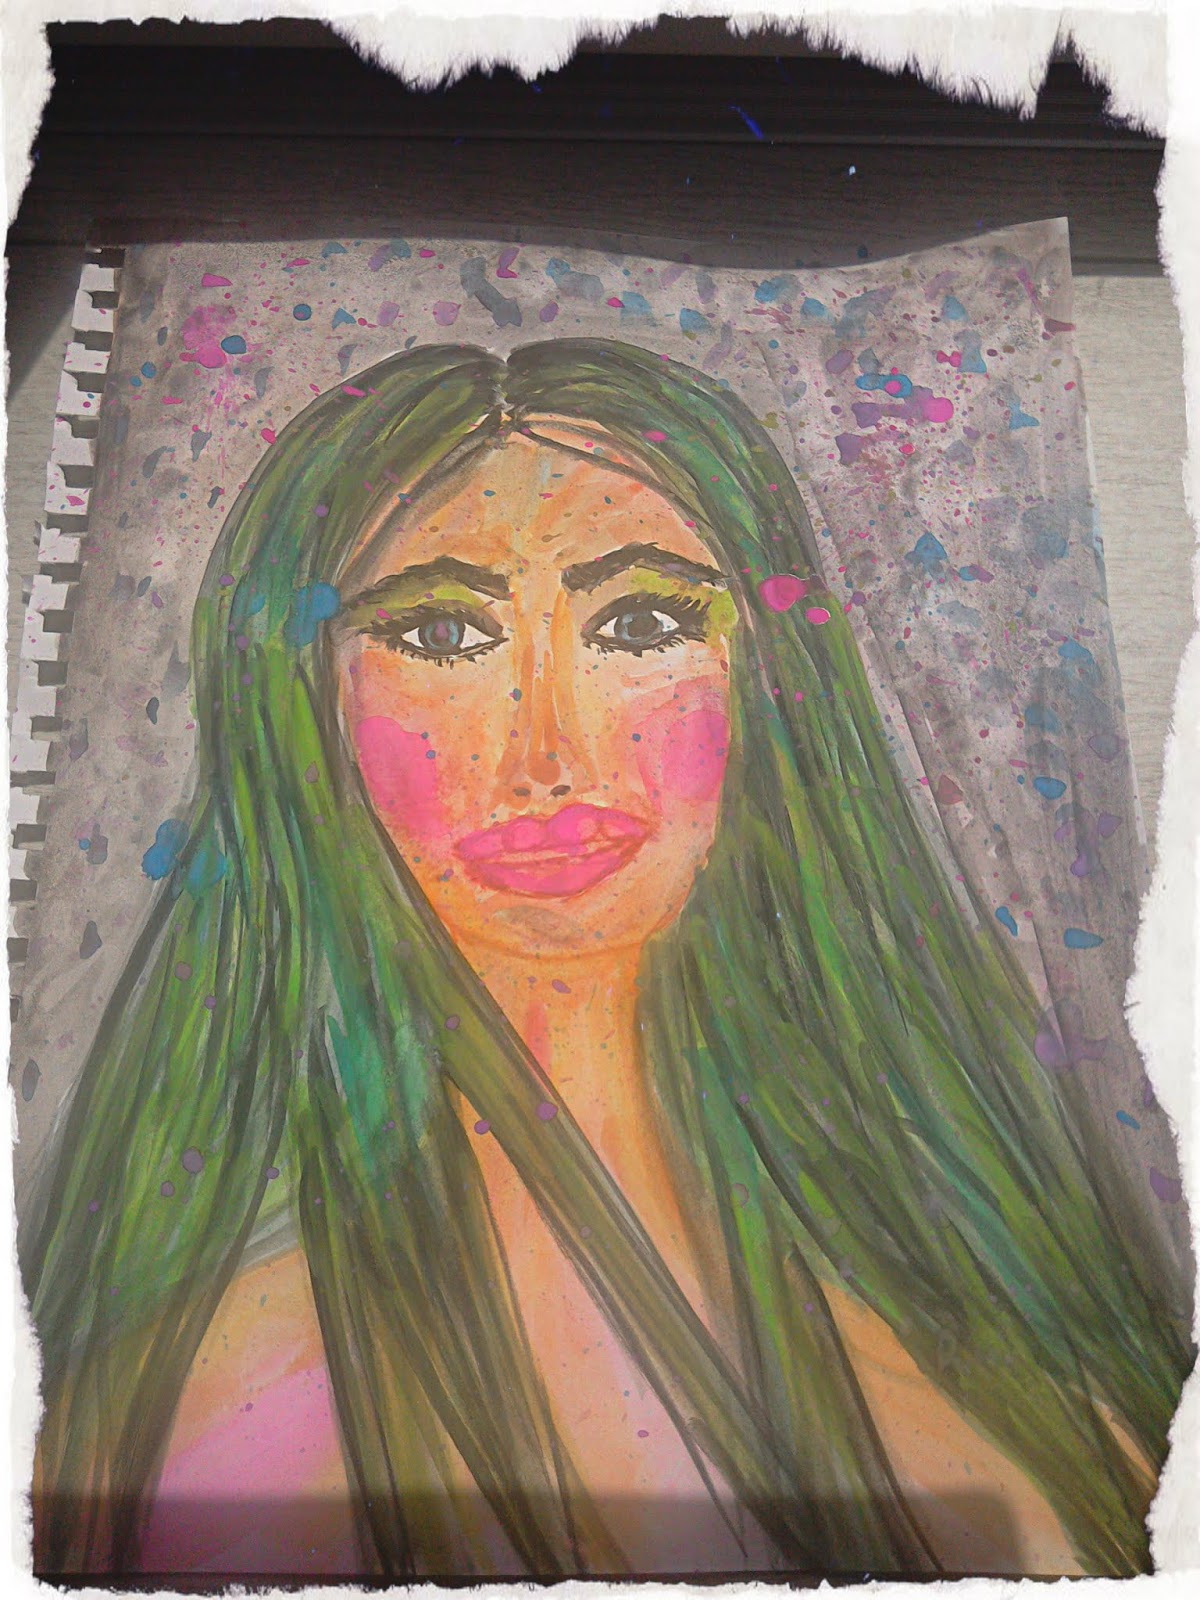 #modaodaradosti girl with green hair